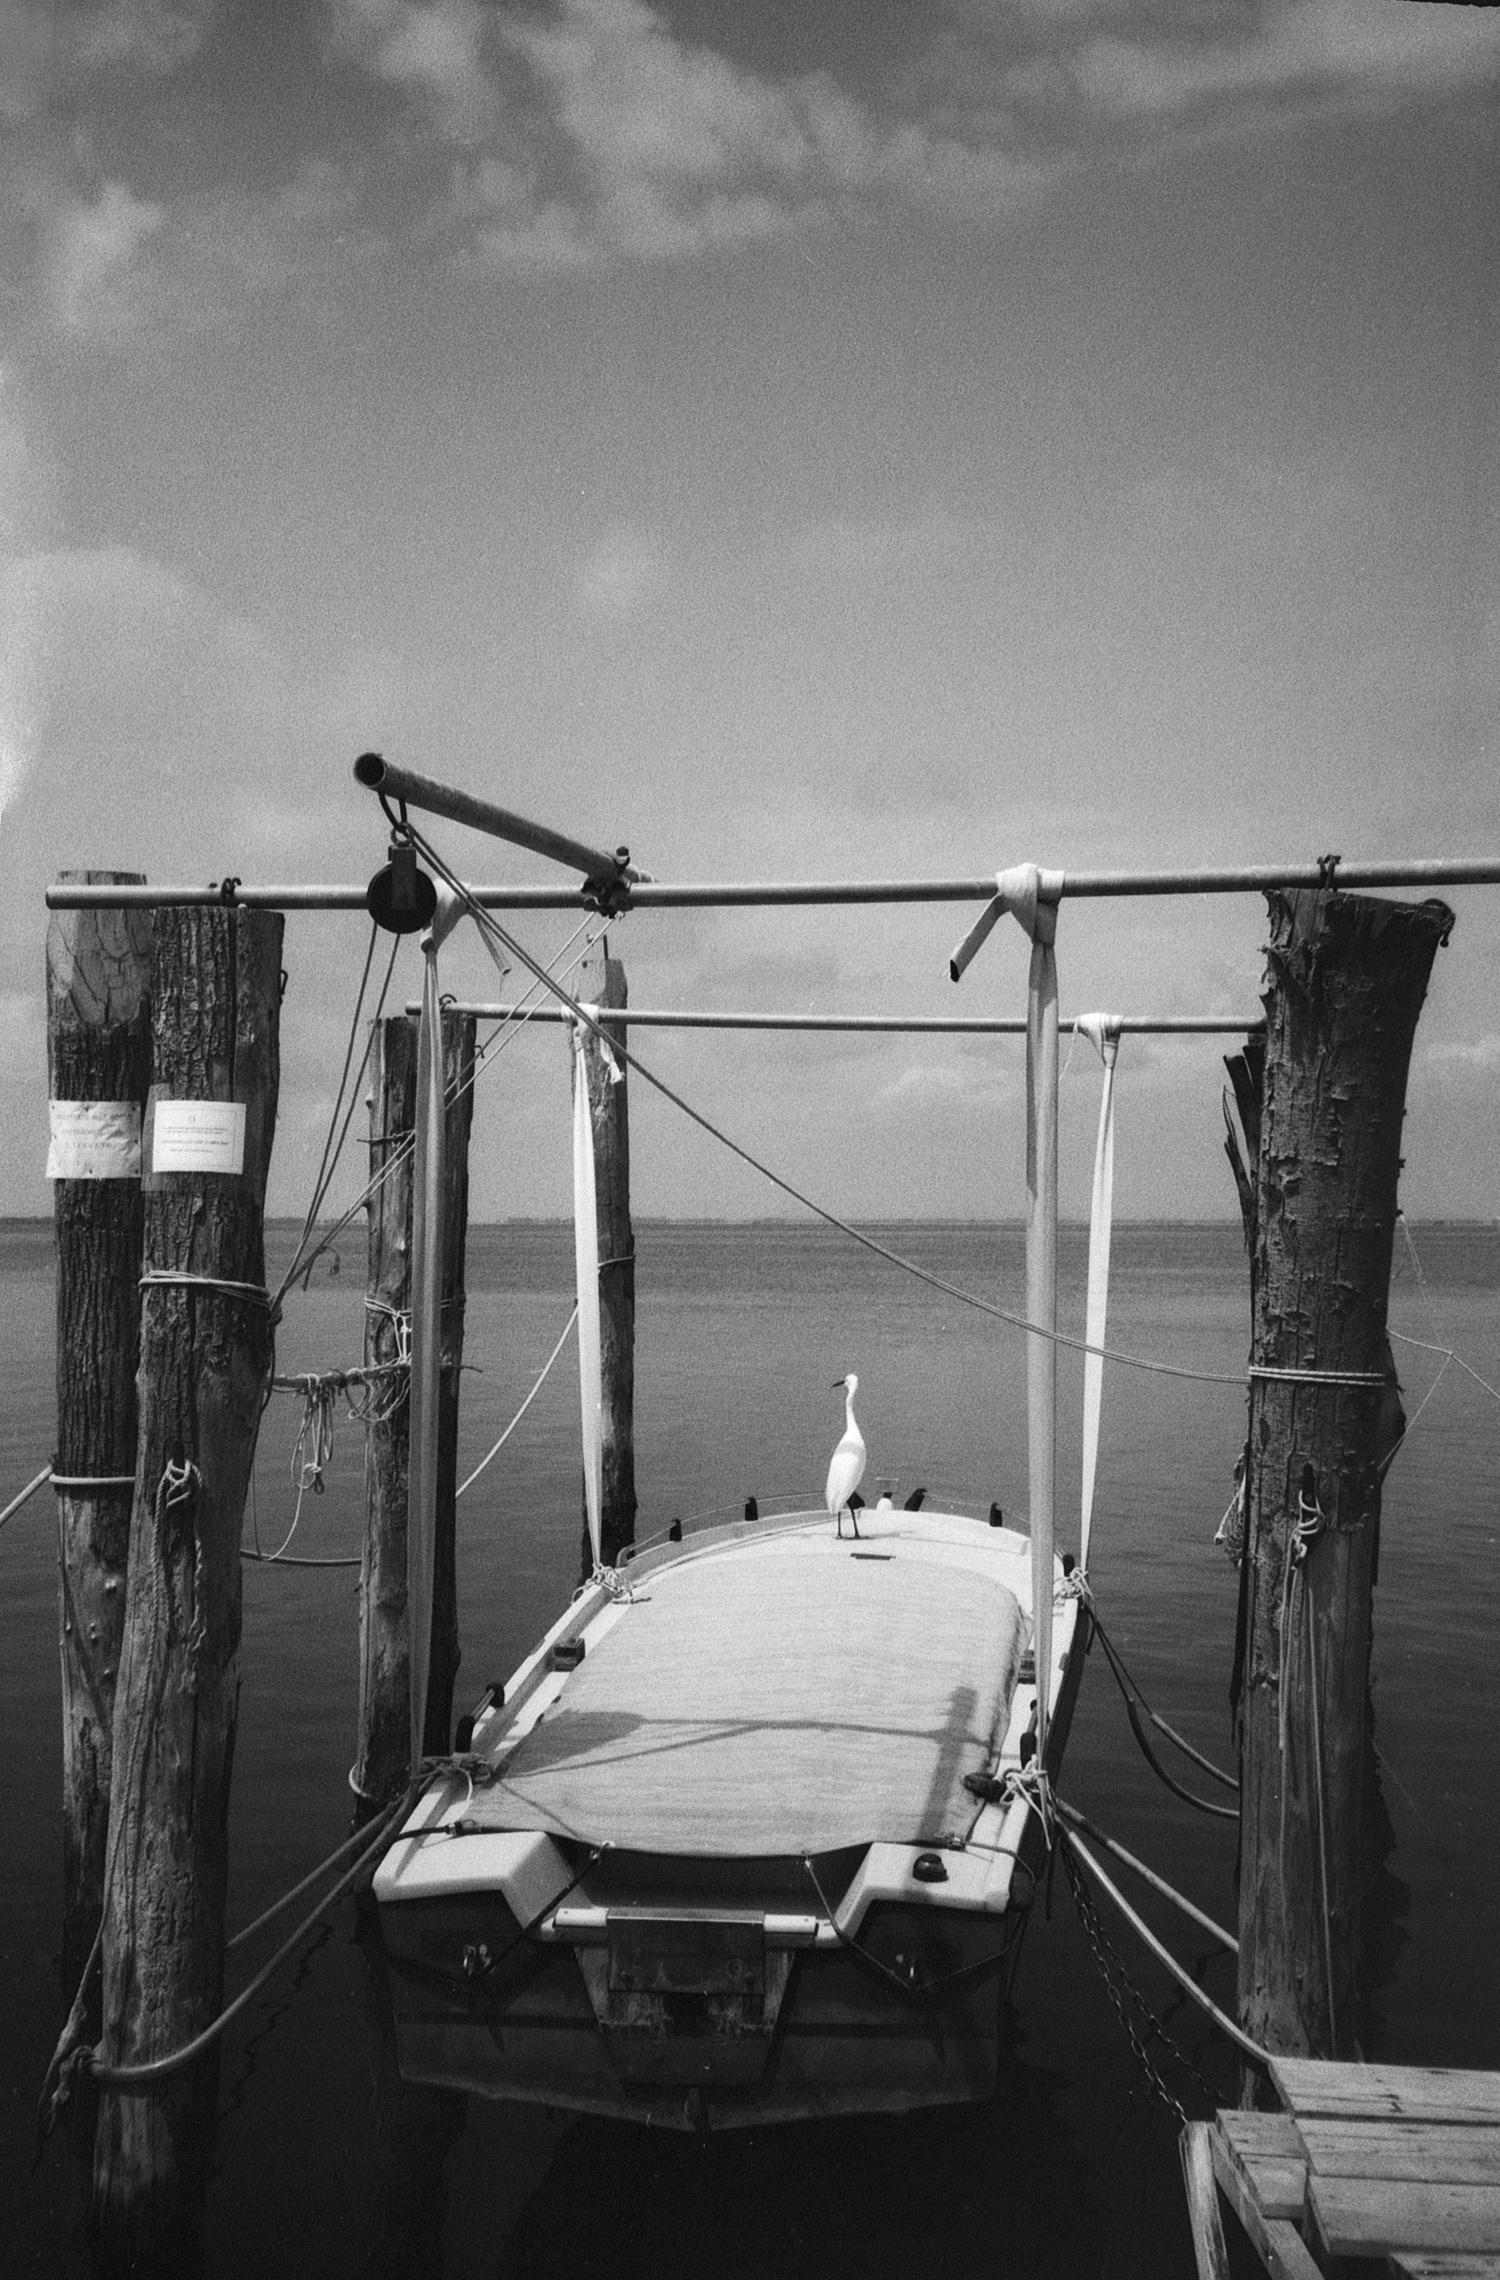 #136 Sea Posts and Boat, Pellestrina, Italy